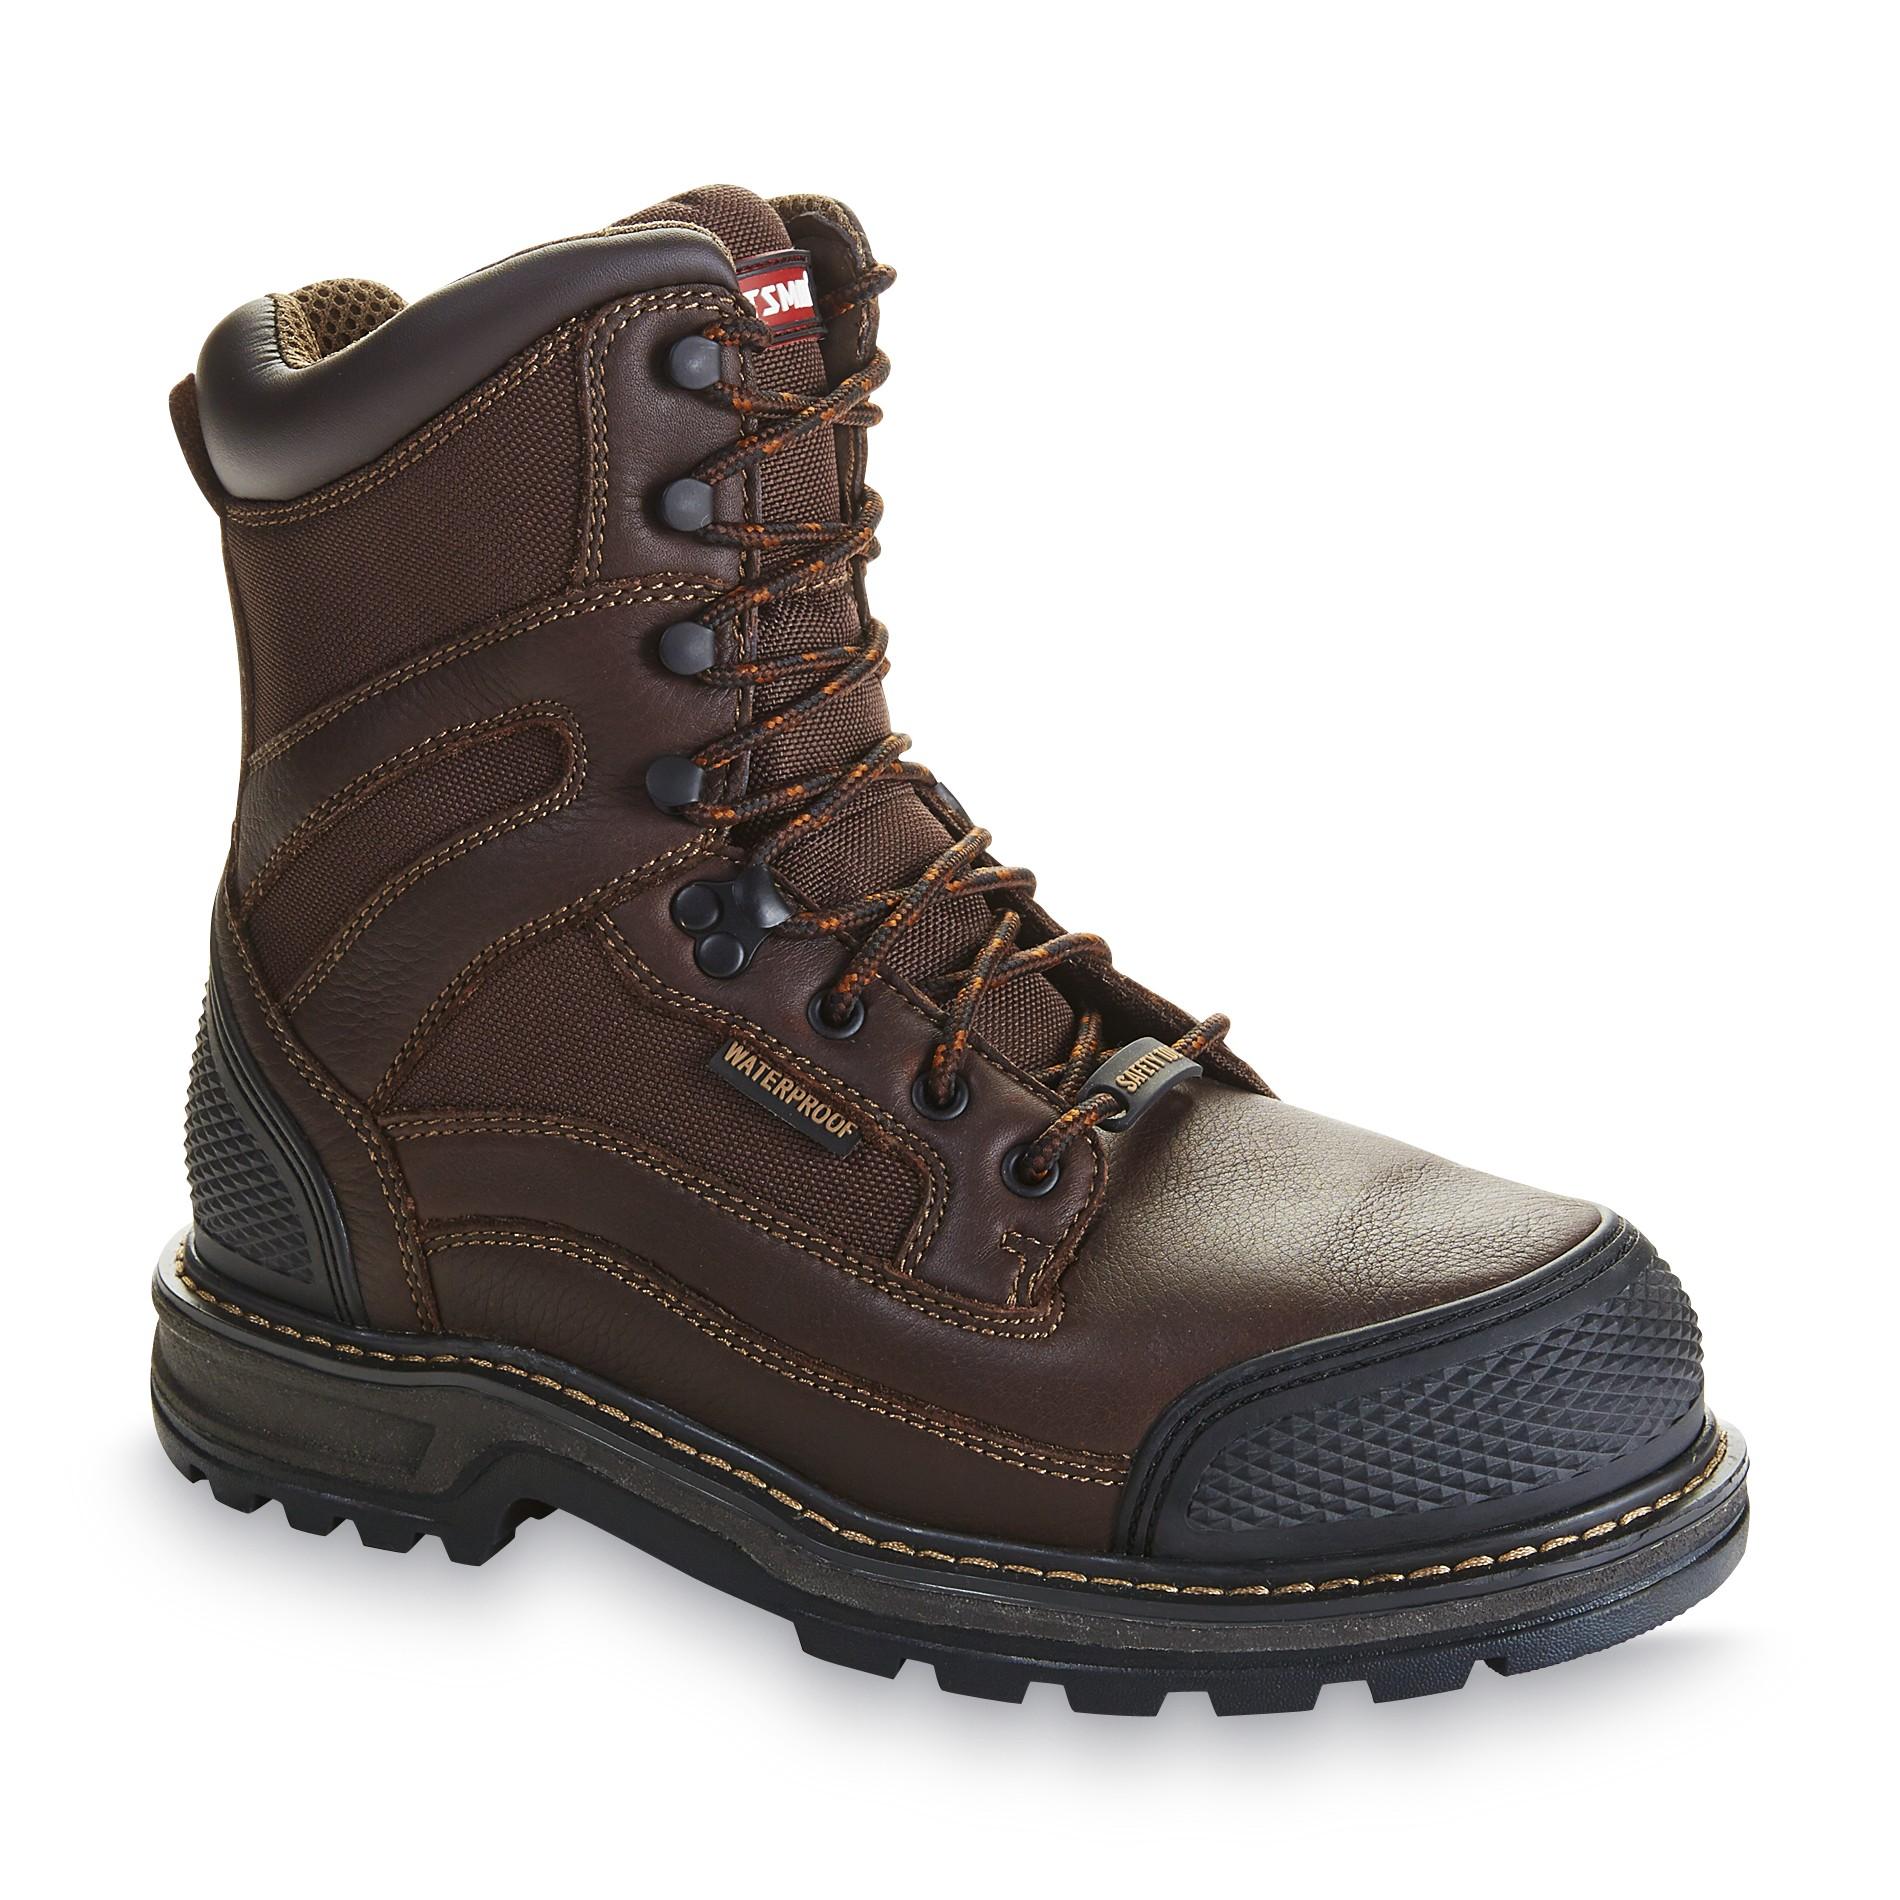 Men&39s Work Shoes &amp Boots: Steel Toe - Kmart